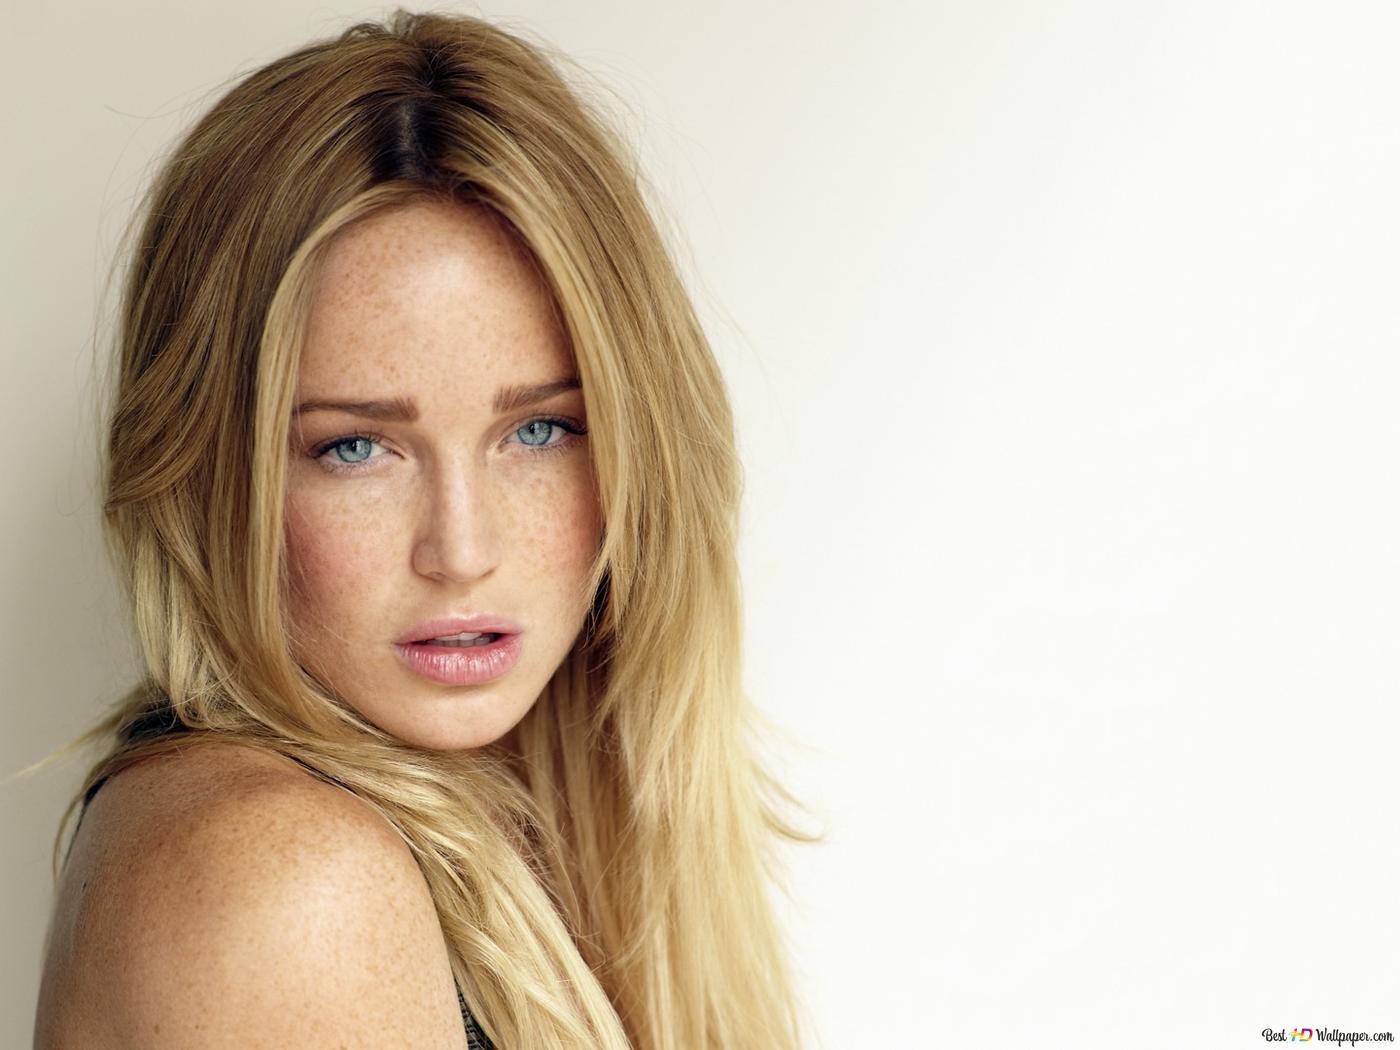 Blonde Caity Lotz Aesthetic Beauty Hd Wallpaper Download